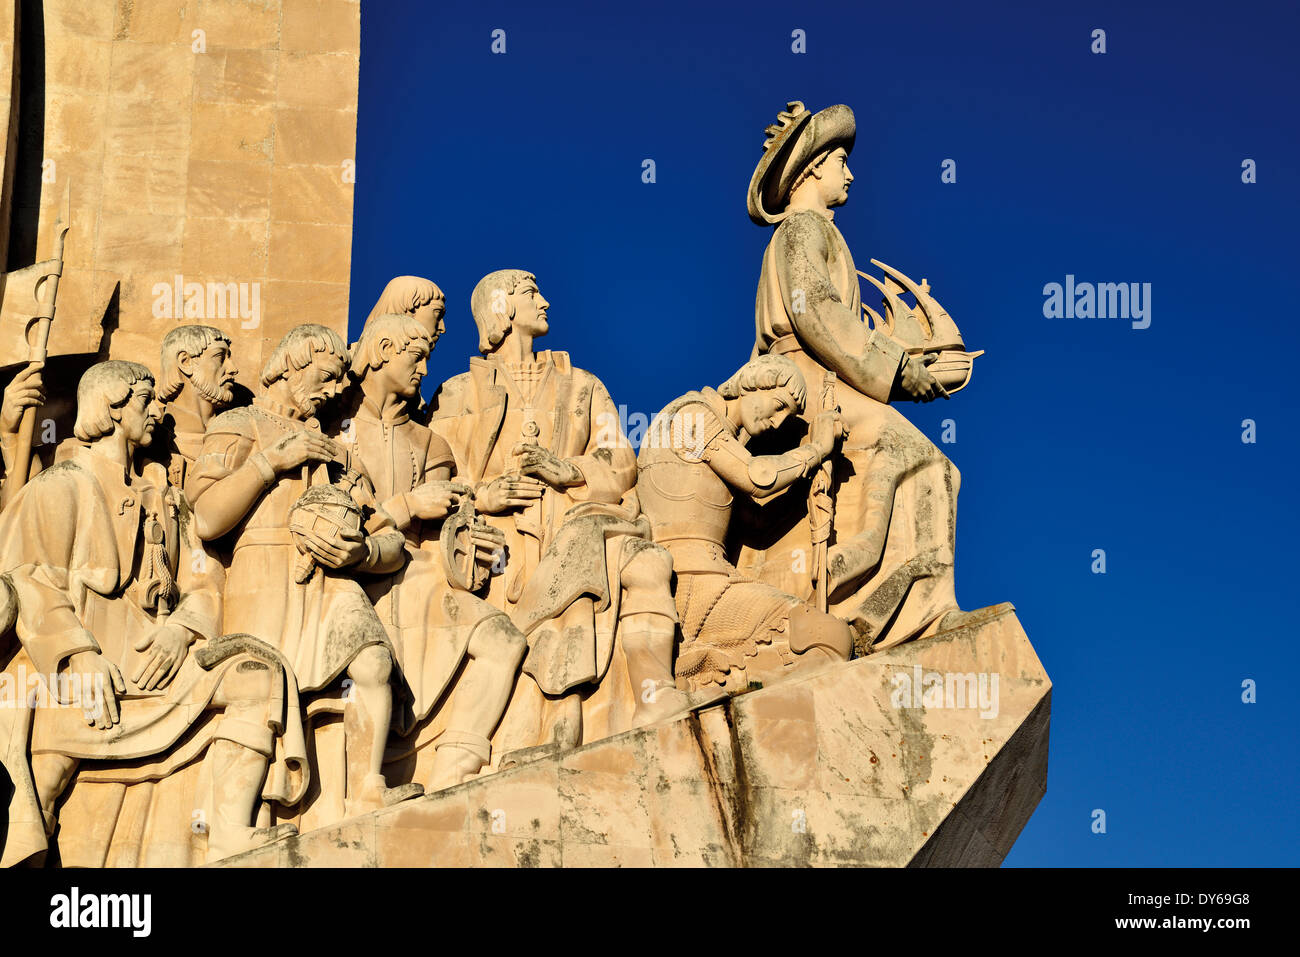 Portugal, Lissabon: Detail des Denkmals der Entdeckungen Stockbild